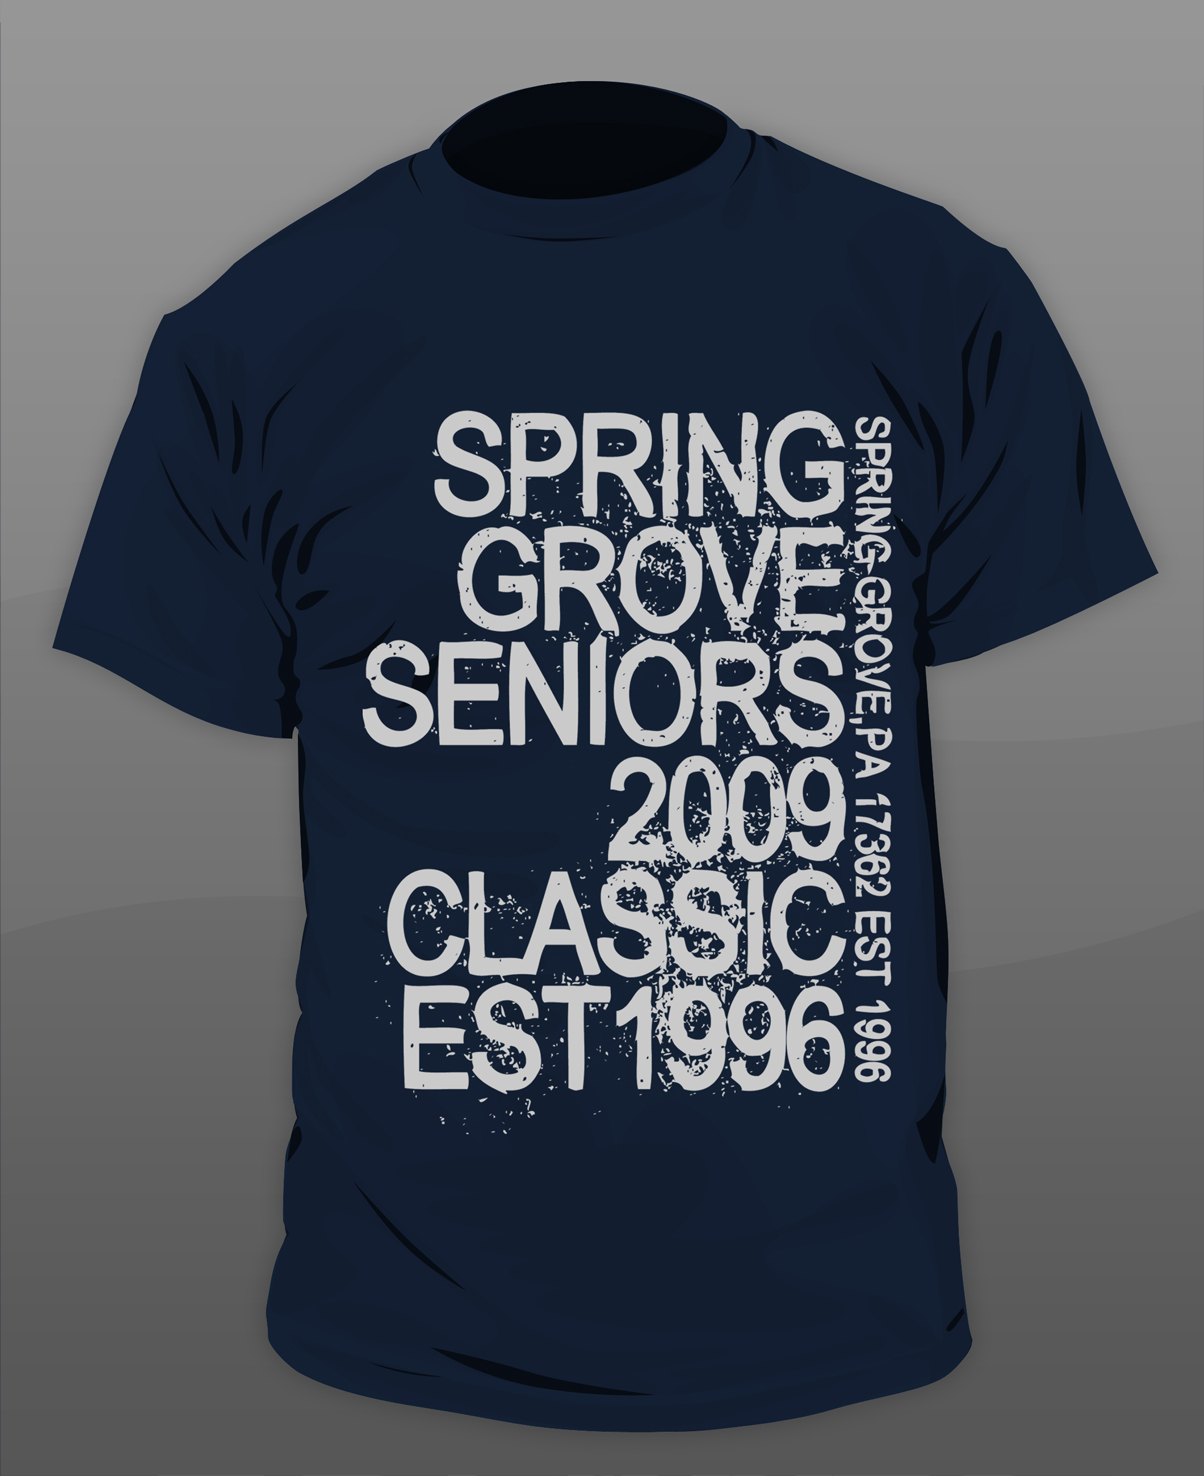 Classroom T Shirt Design ~ Senior class tshirt design by gkgfx on deviantart